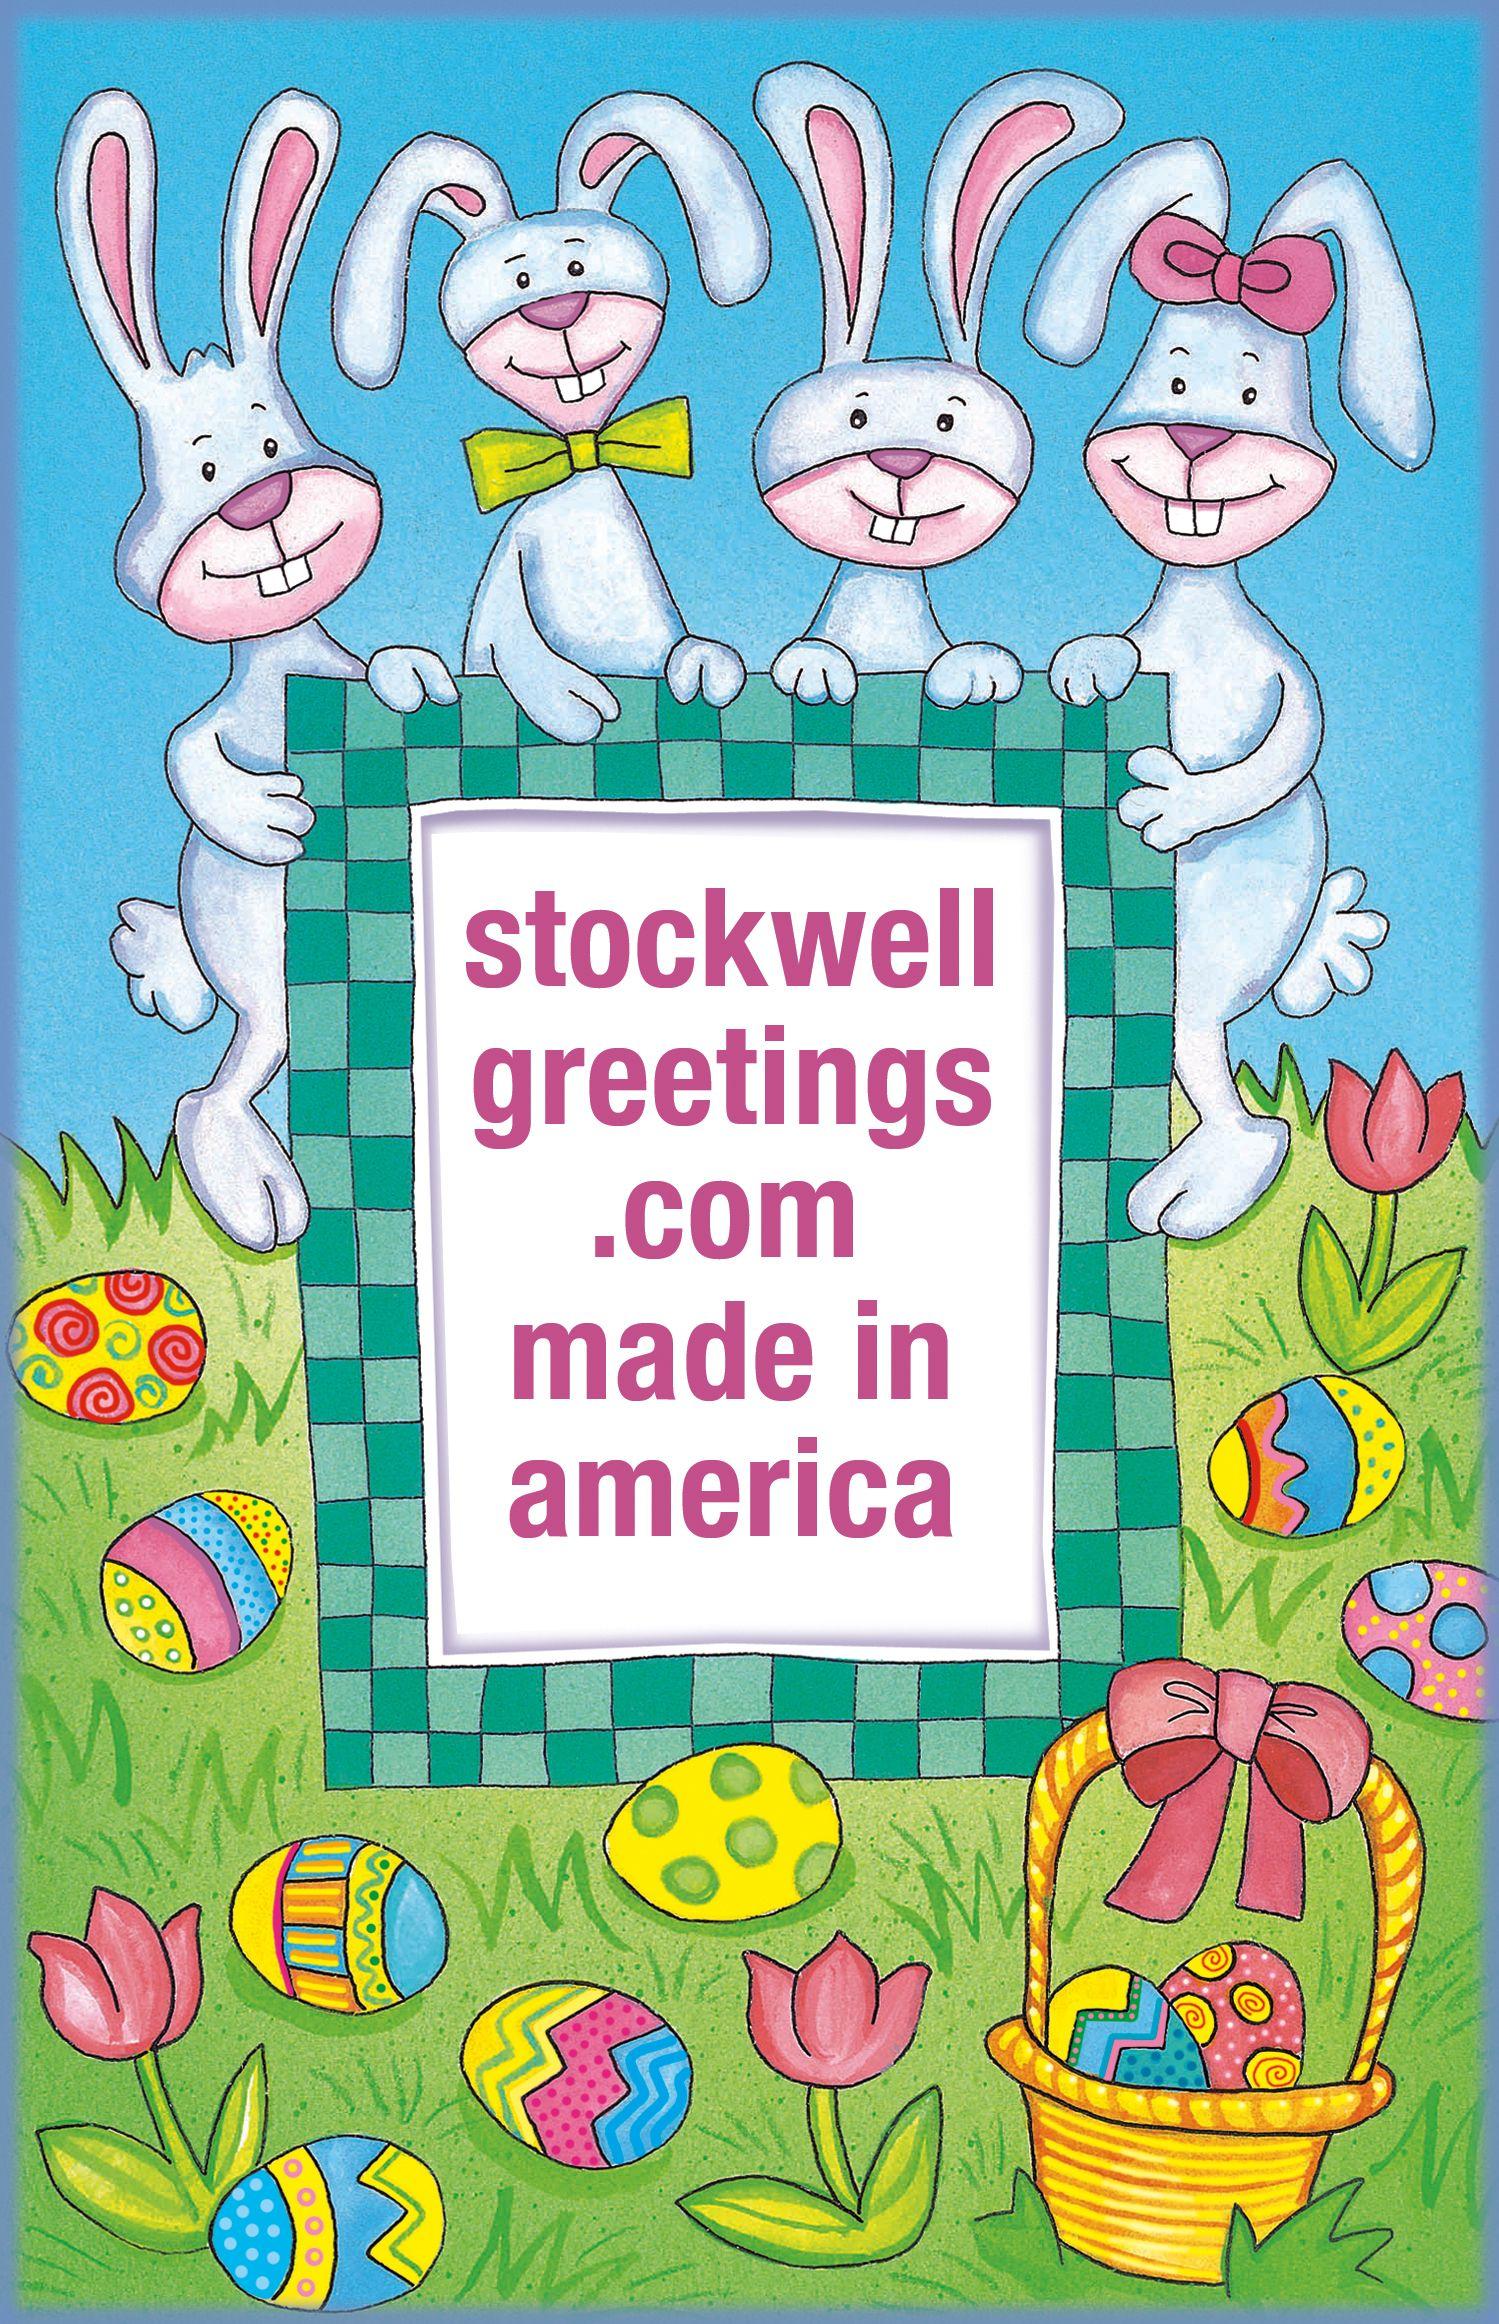 Stockwellgreetings Imagesg 14992324 Stockwellgreetings